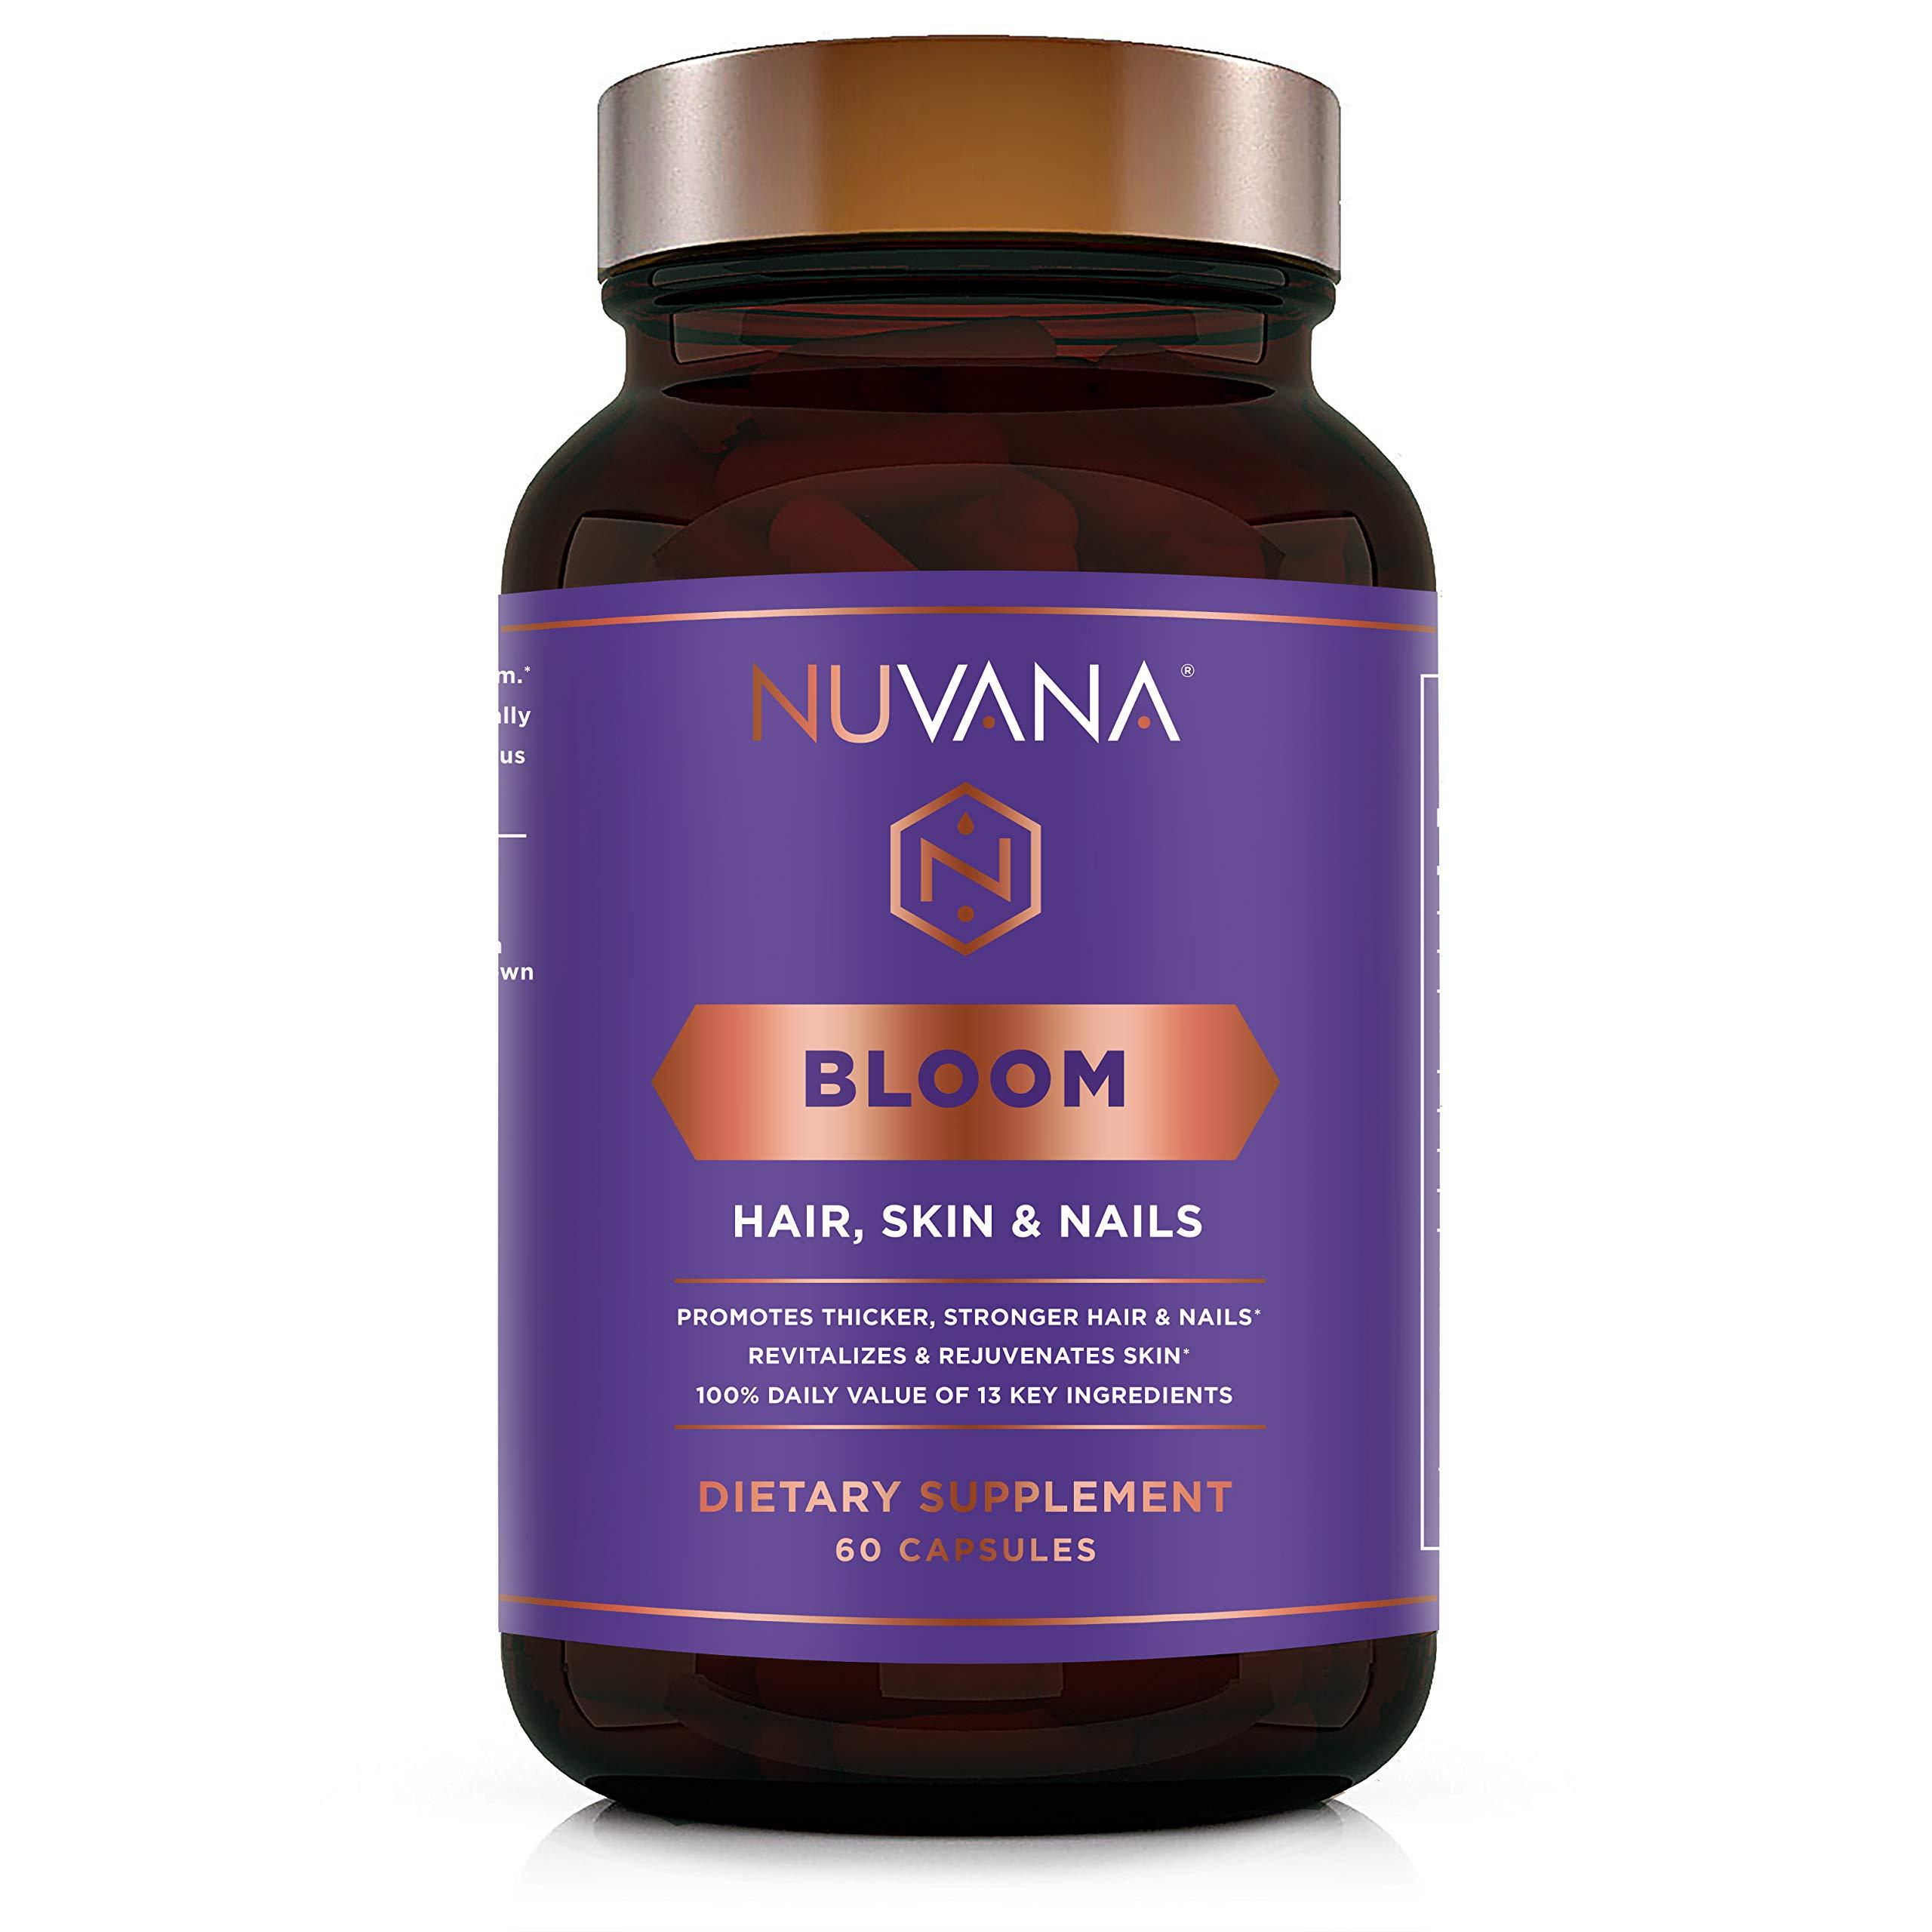 Bloom for Healthy Hair, Skin & Nails | 5000mcg Biotin, MSM, Hyaluronic Acid, B Complex Vitamins | Vegan, Non-GMO, Gluten Free | Growth, Thickening, Strength for Men & Women | 60 Capsules